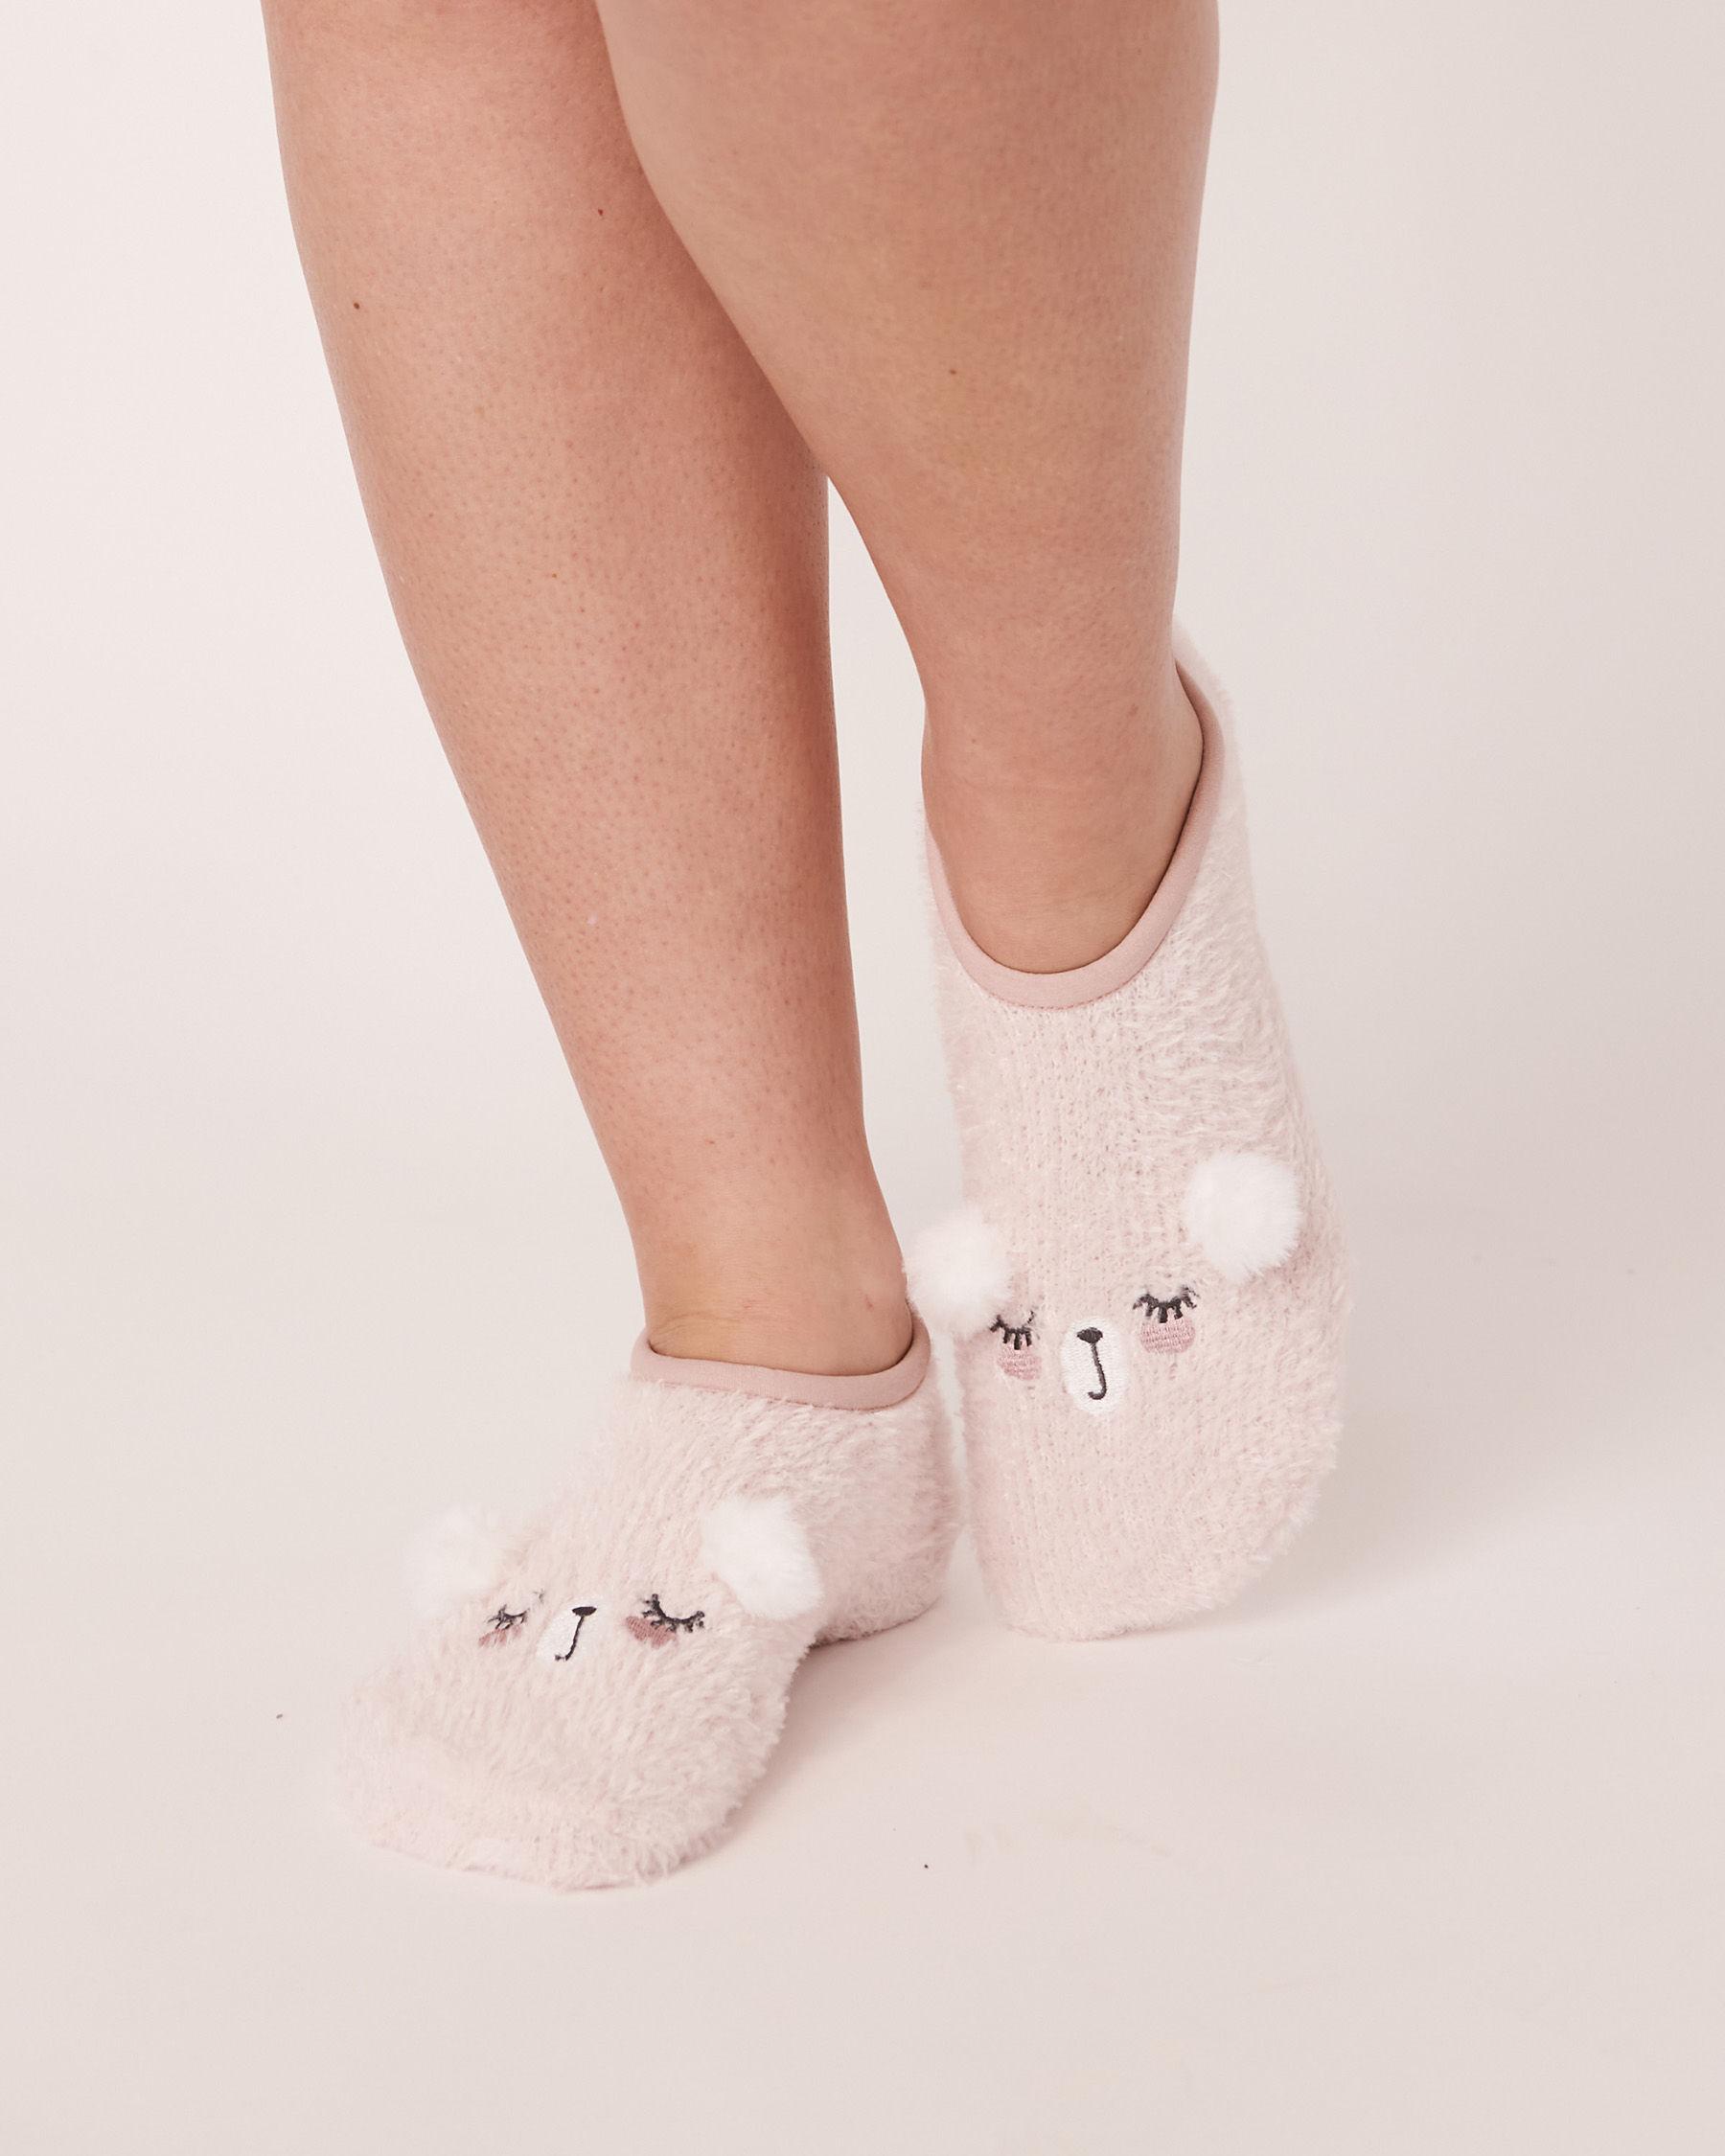 LA VIE EN ROSE Embroidery Slippers Socks Light pink 40700083 - View1